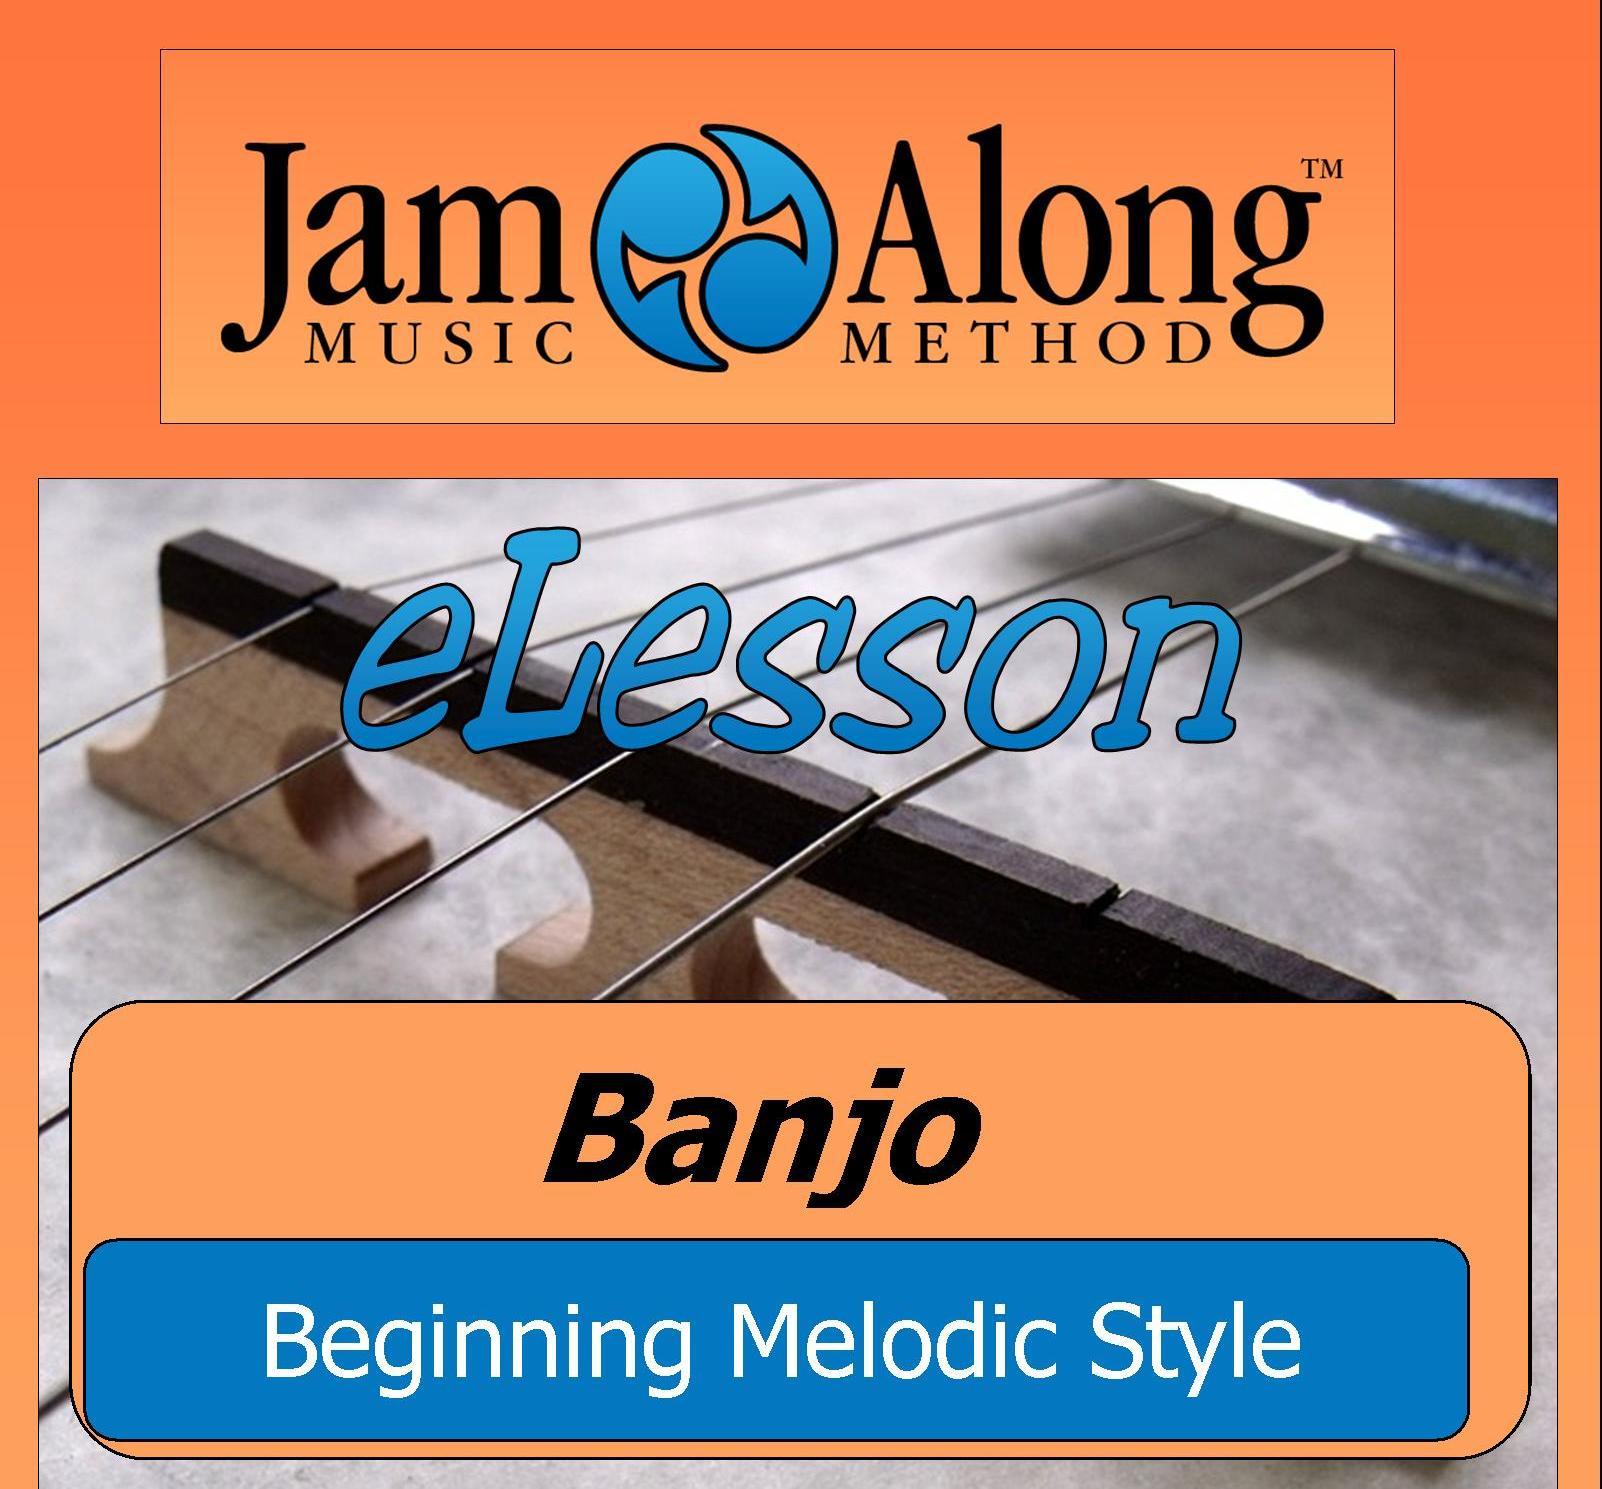 Beginning Melodic Style